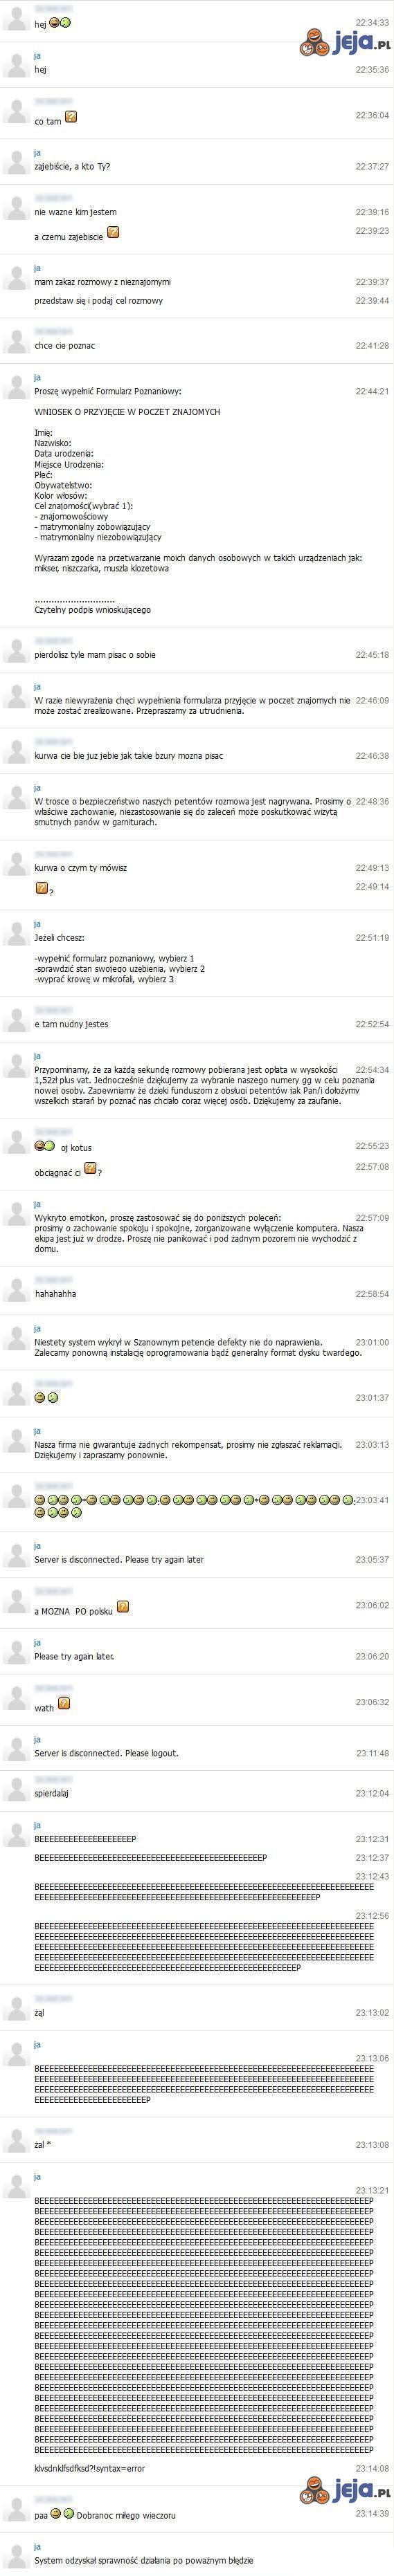 GG trollowanie